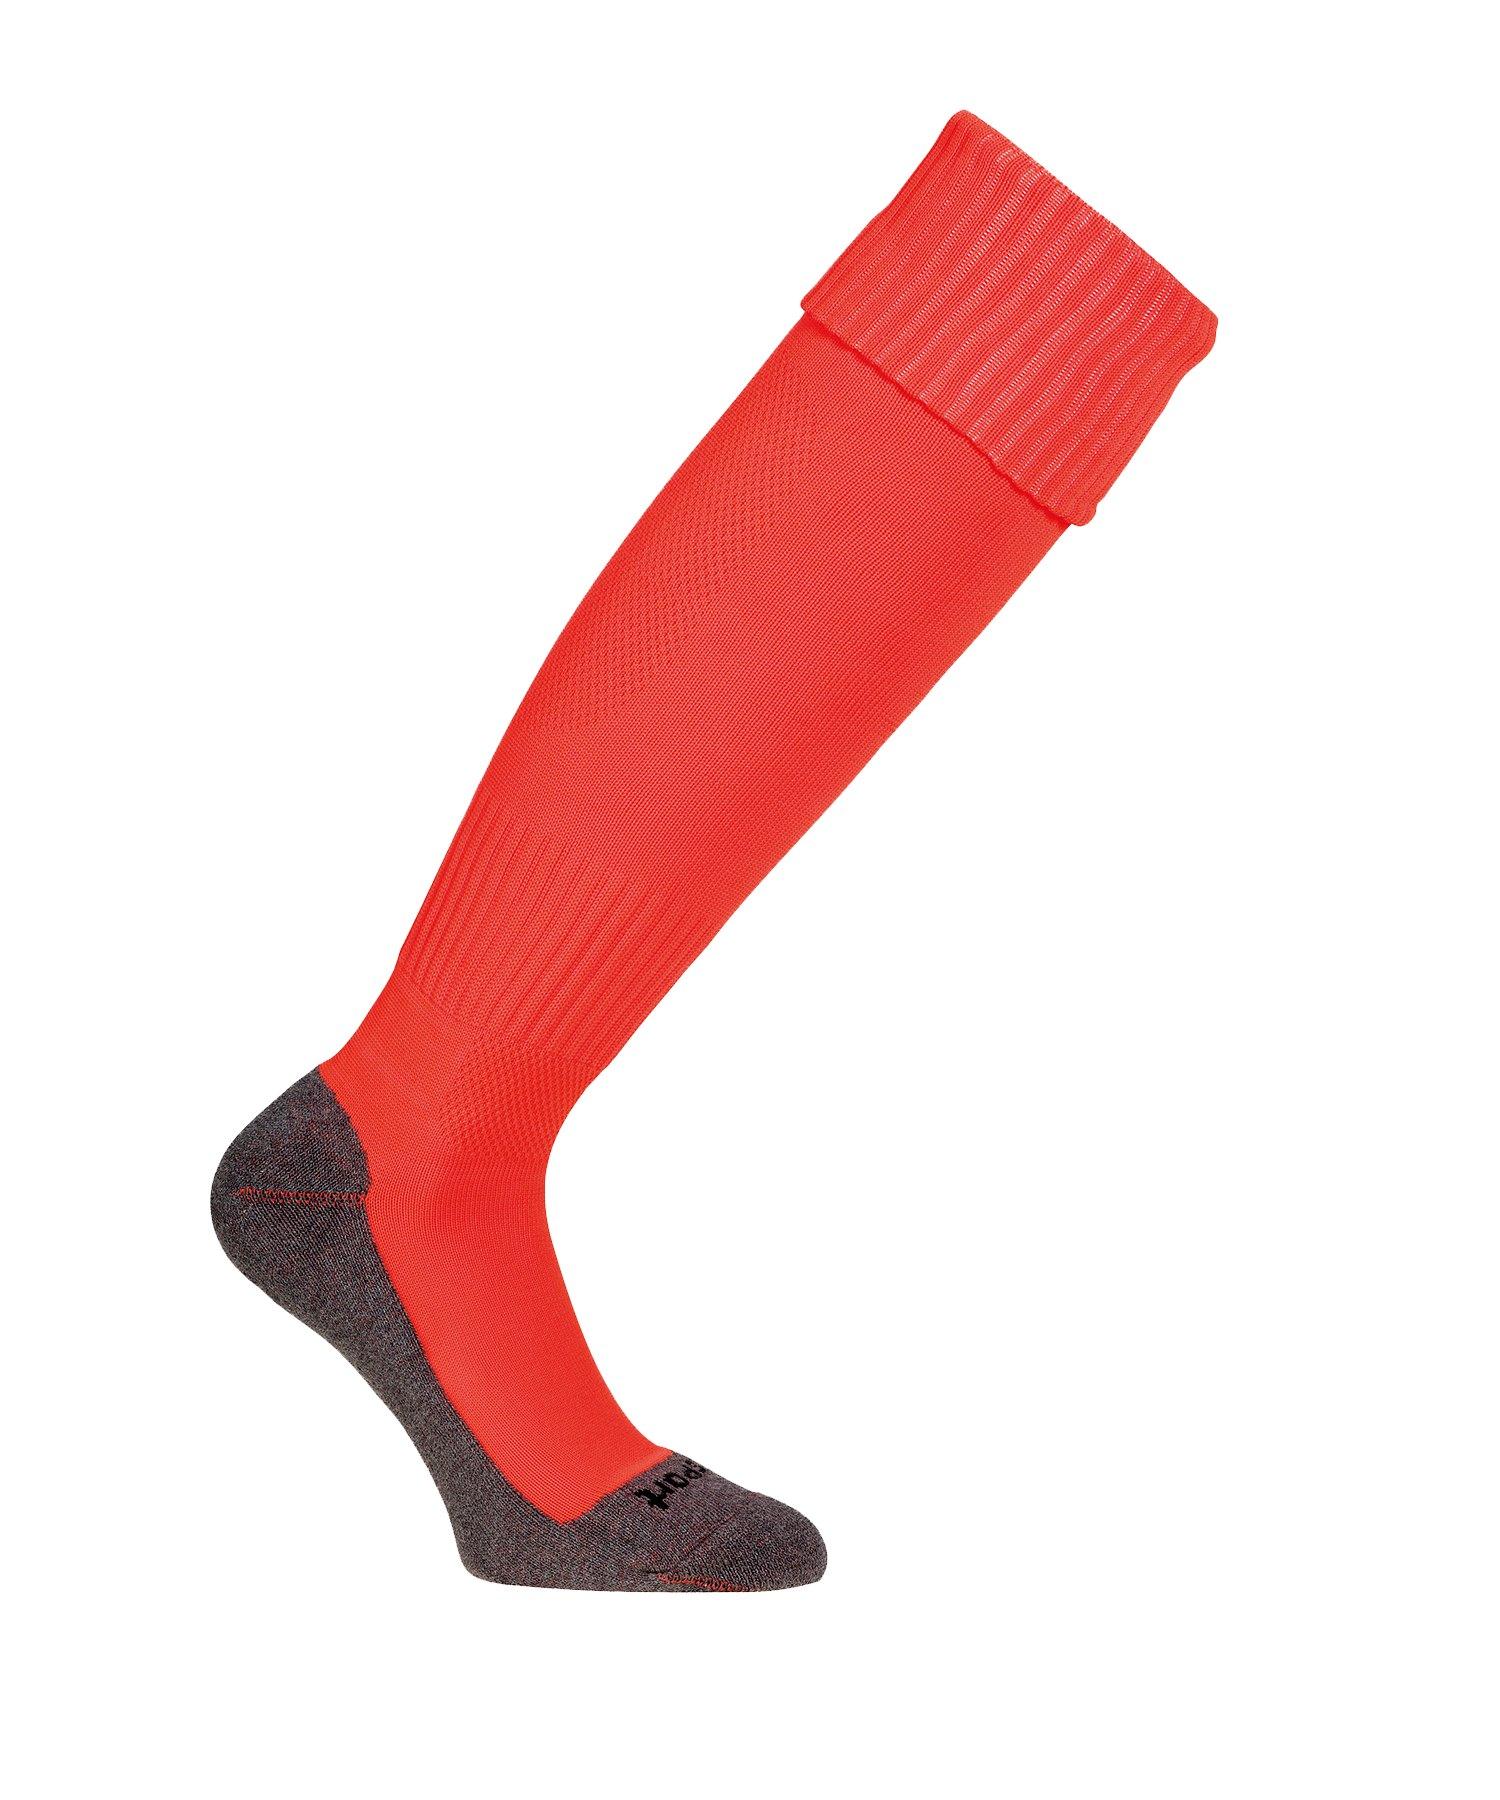 Uhlsport Team Pro Essential Stutzenstrumpf Rot F23 - Rot